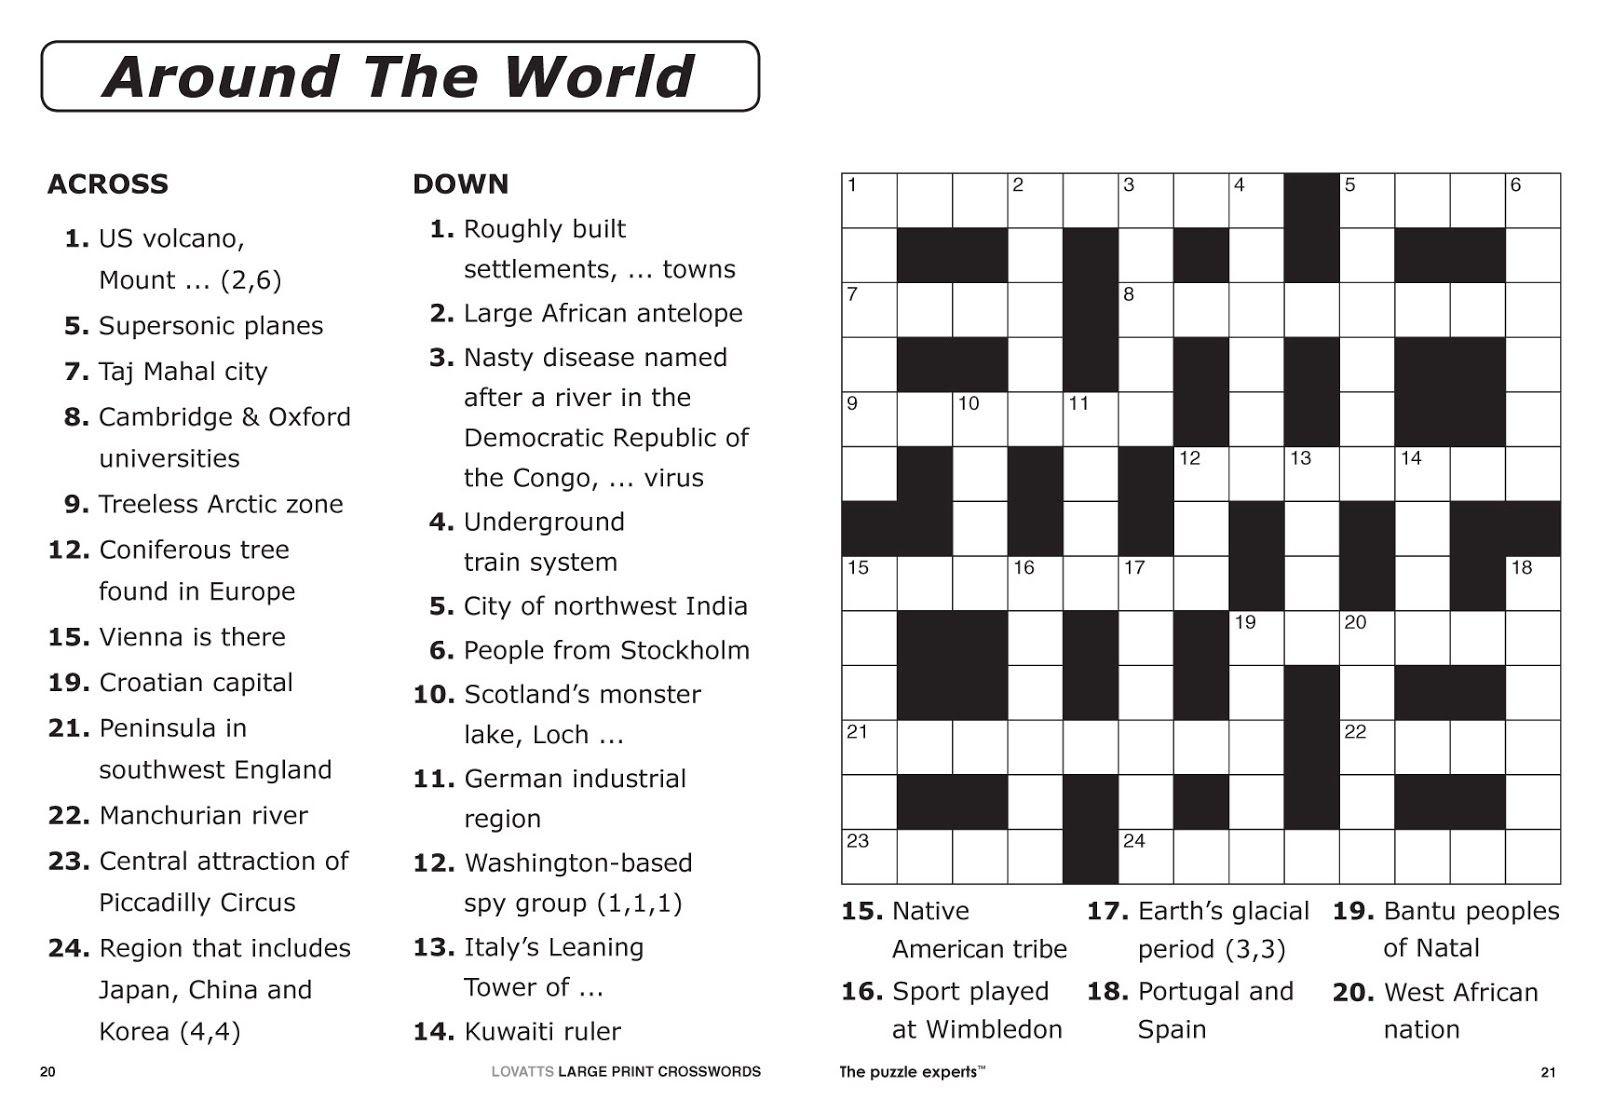 Free Printable Large Print Crossword Puzzles   M3U8 - Printable Crossword For 10 Year Olds